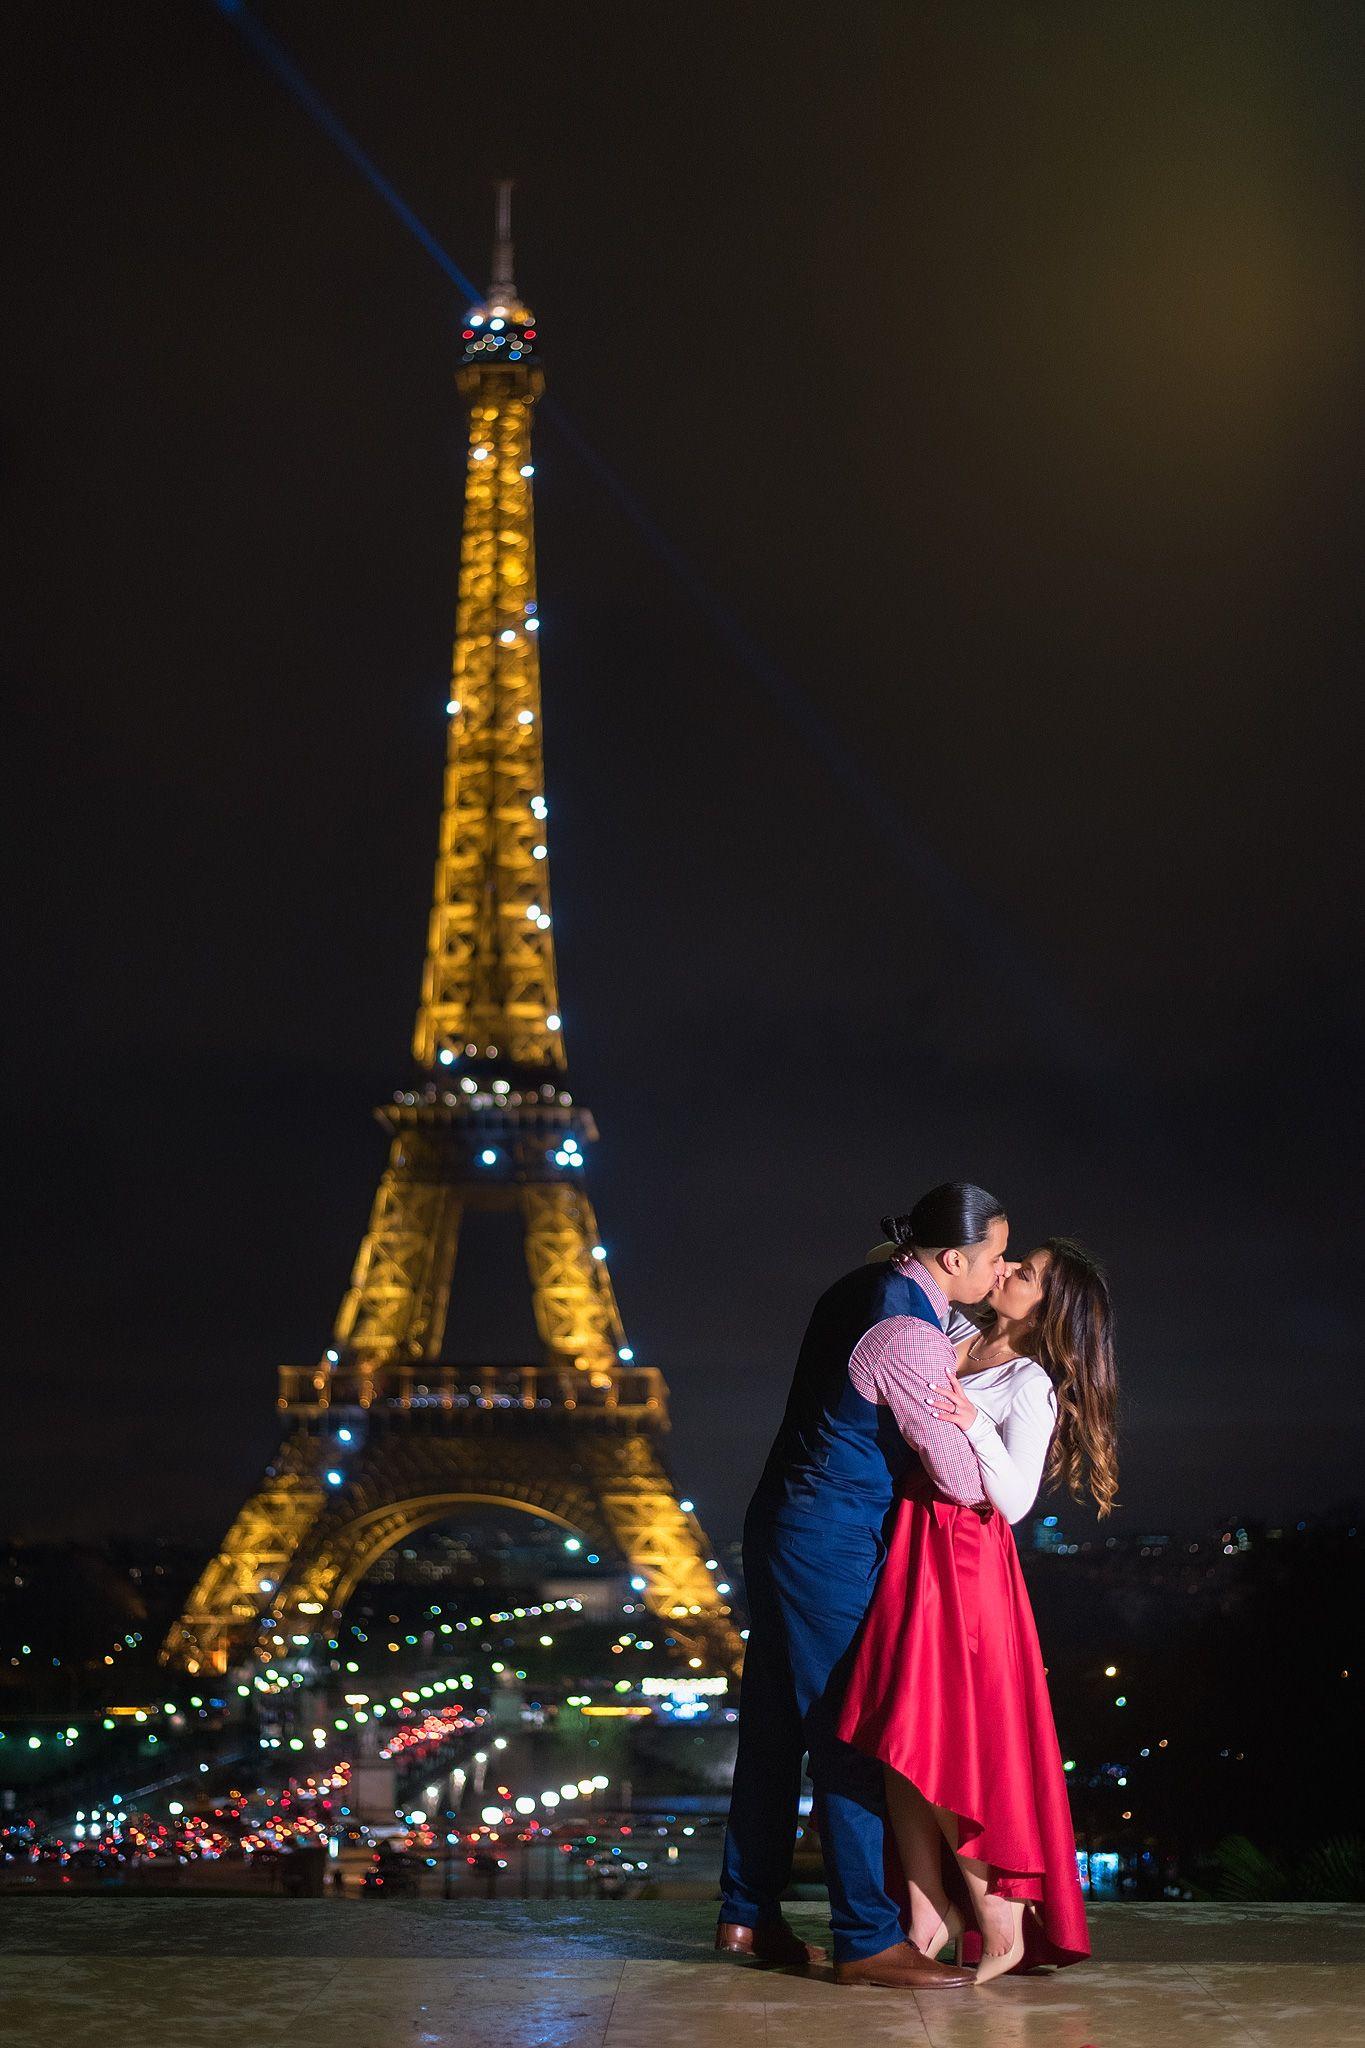 Paris photos - The portfolio of The Paris Photographer team